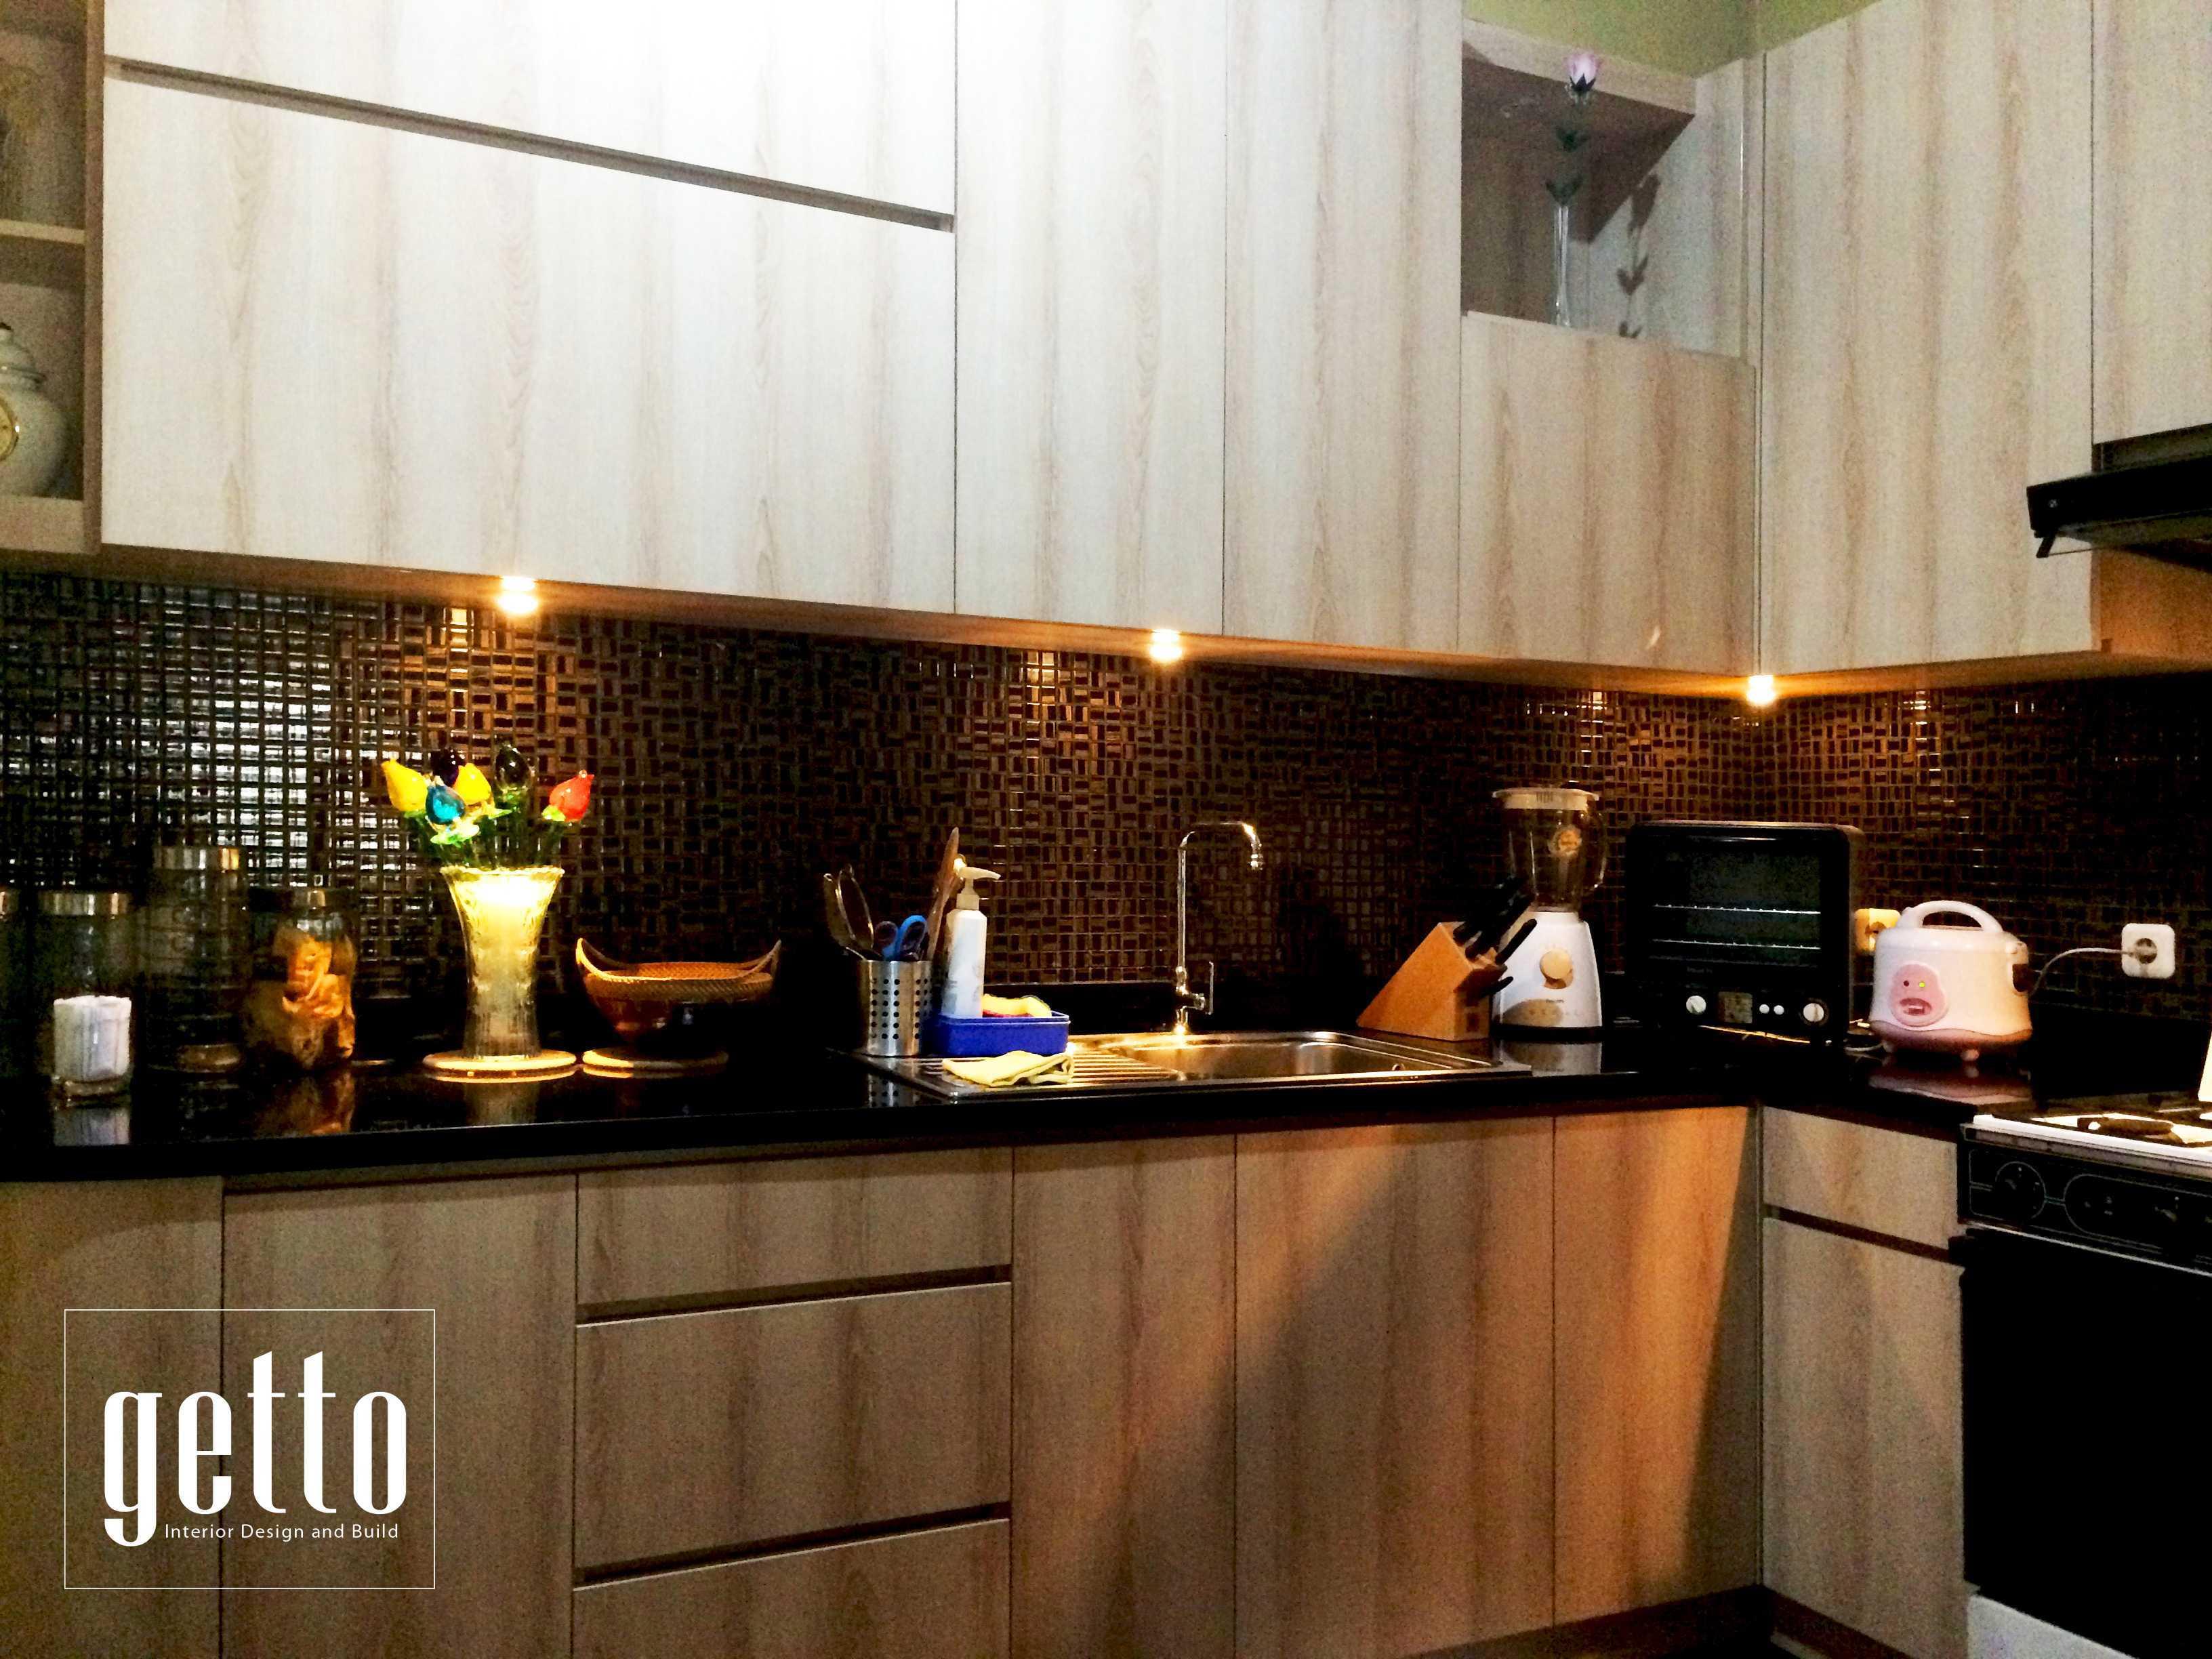 Getto Id Kitchen Set Villa Melati Mas Bsd Bsd Kitchen Modern  14163